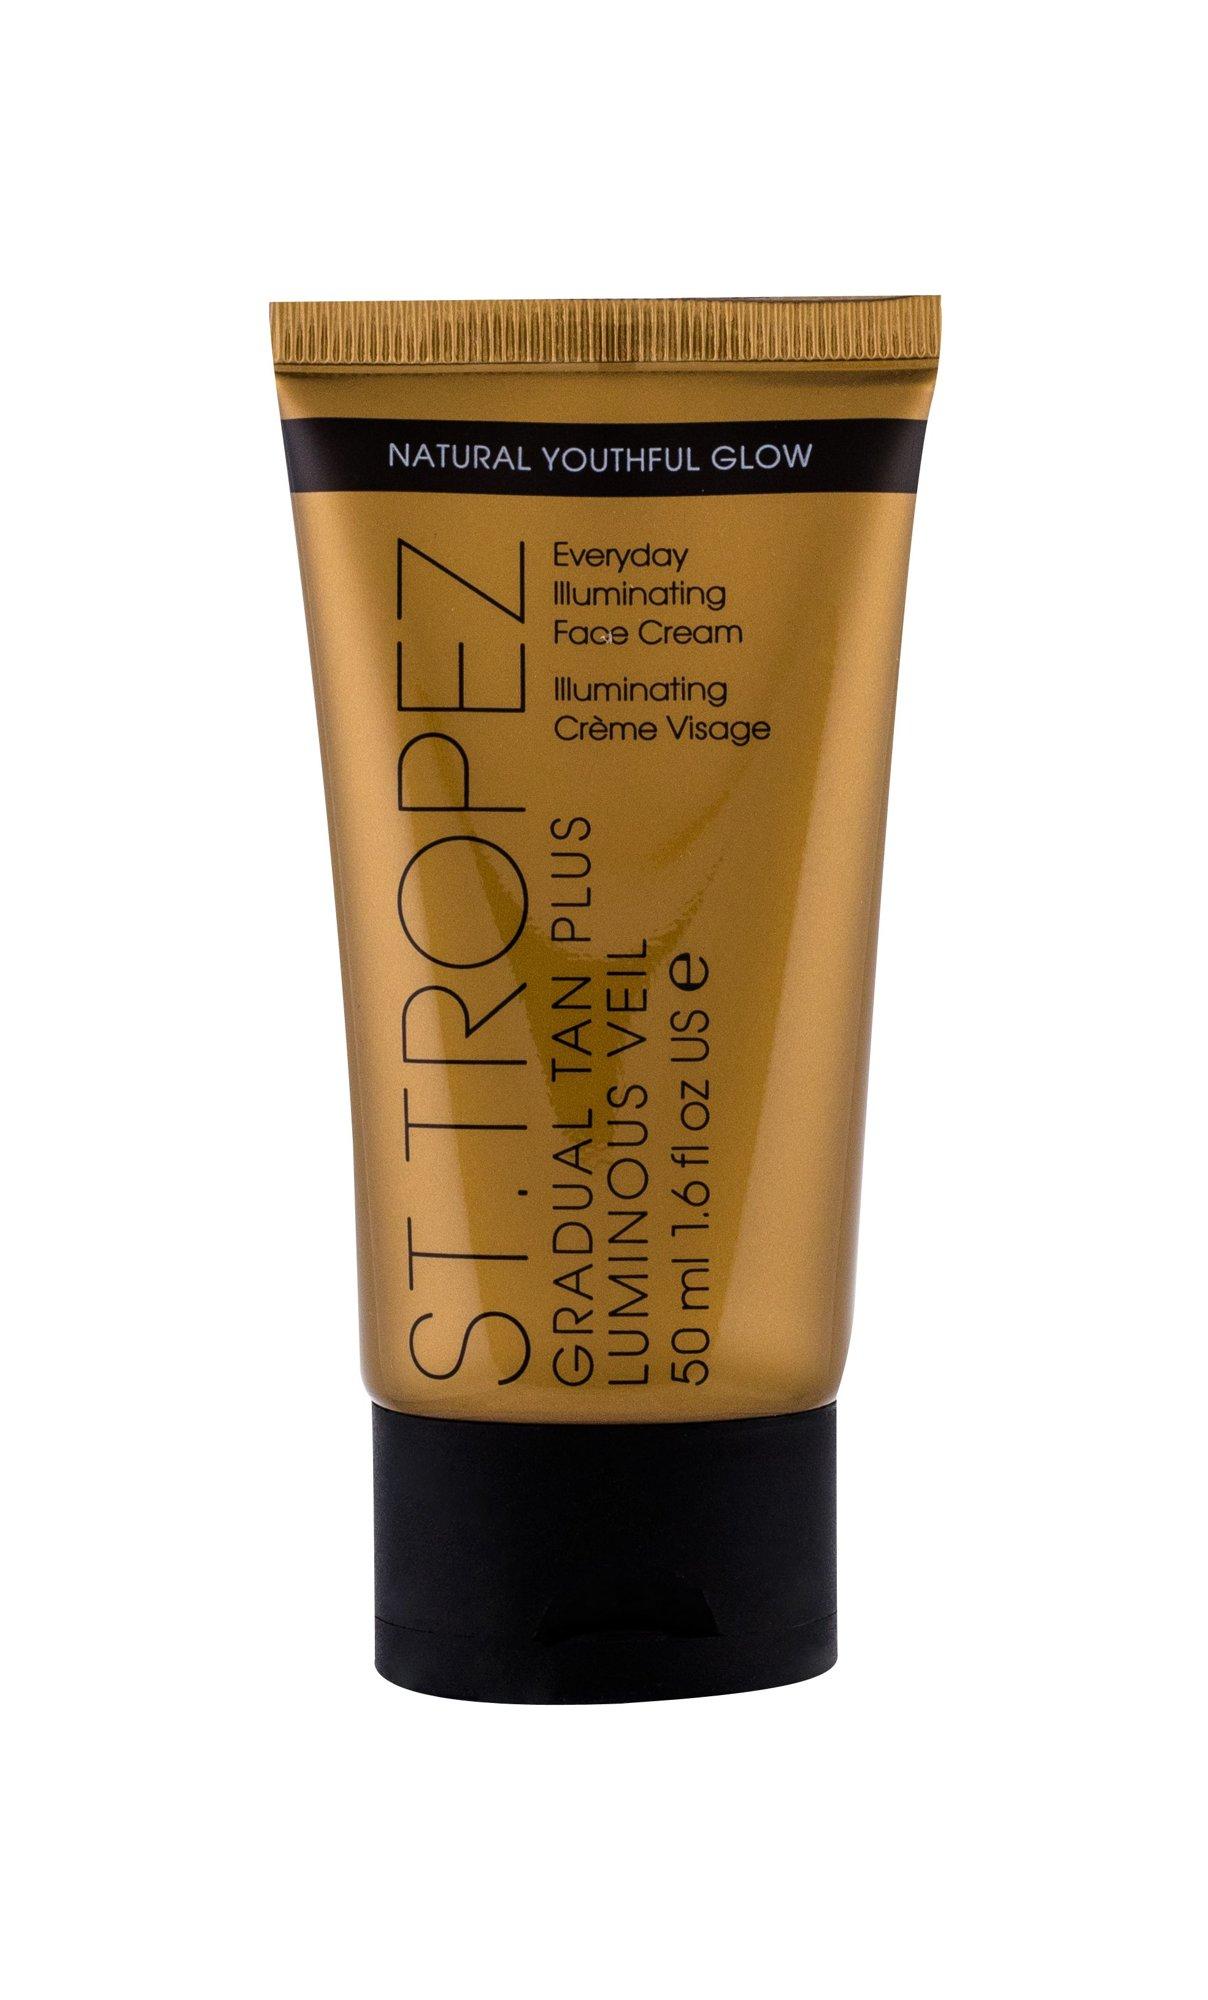 St.Tropez Gradual Tan Self Tanning Product 50ml  Luminous Veil